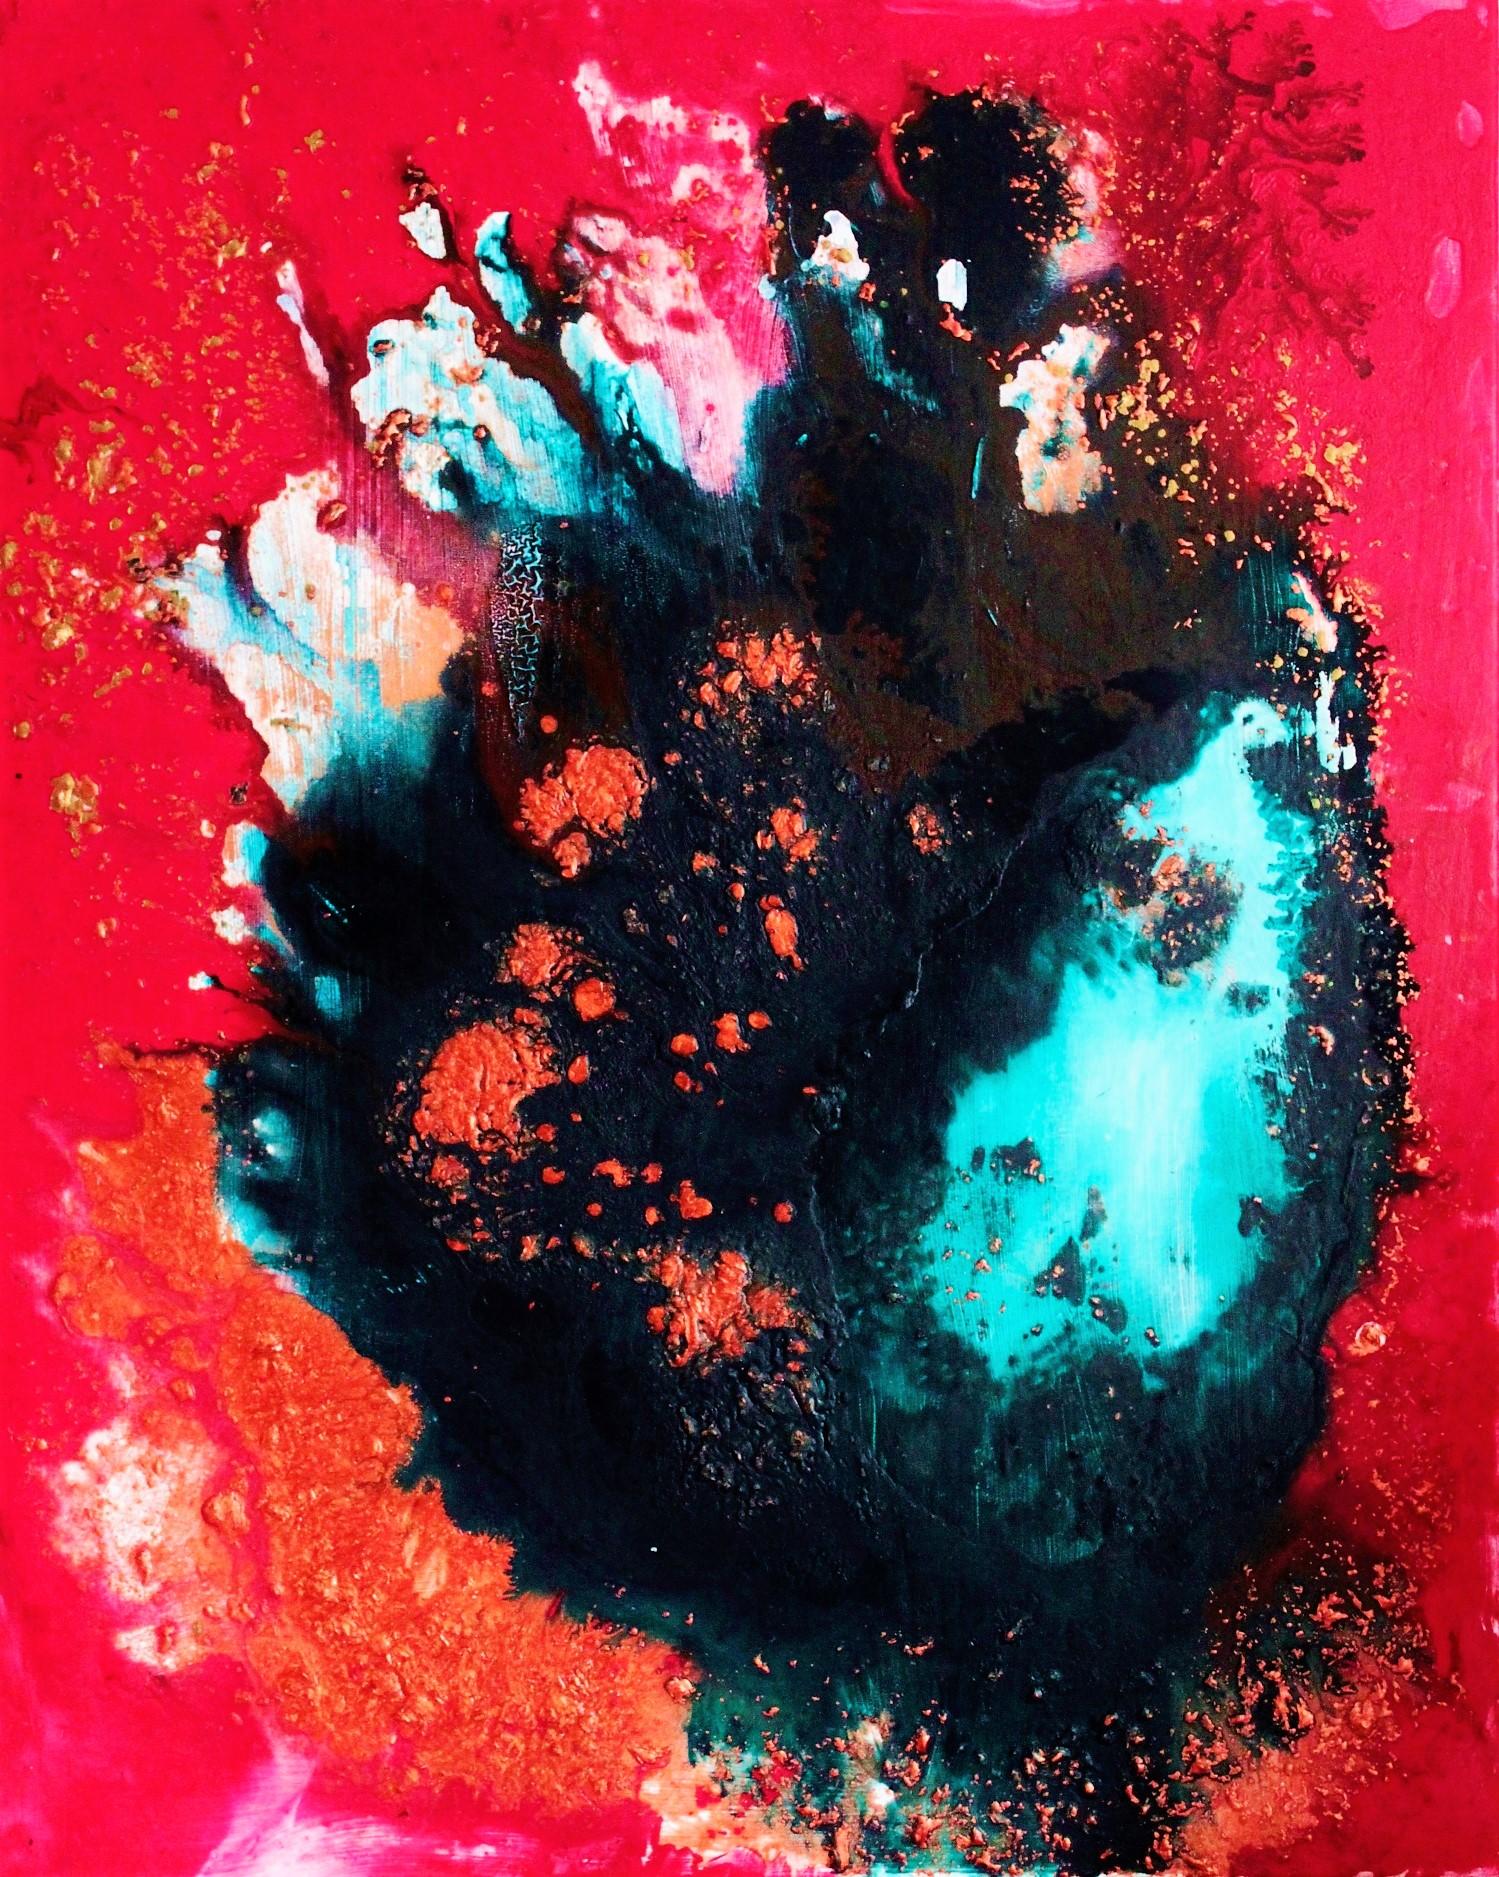 Pakahtua, Akryyli kankaalle, 100 cm x 80 cm  Myyty / Sold